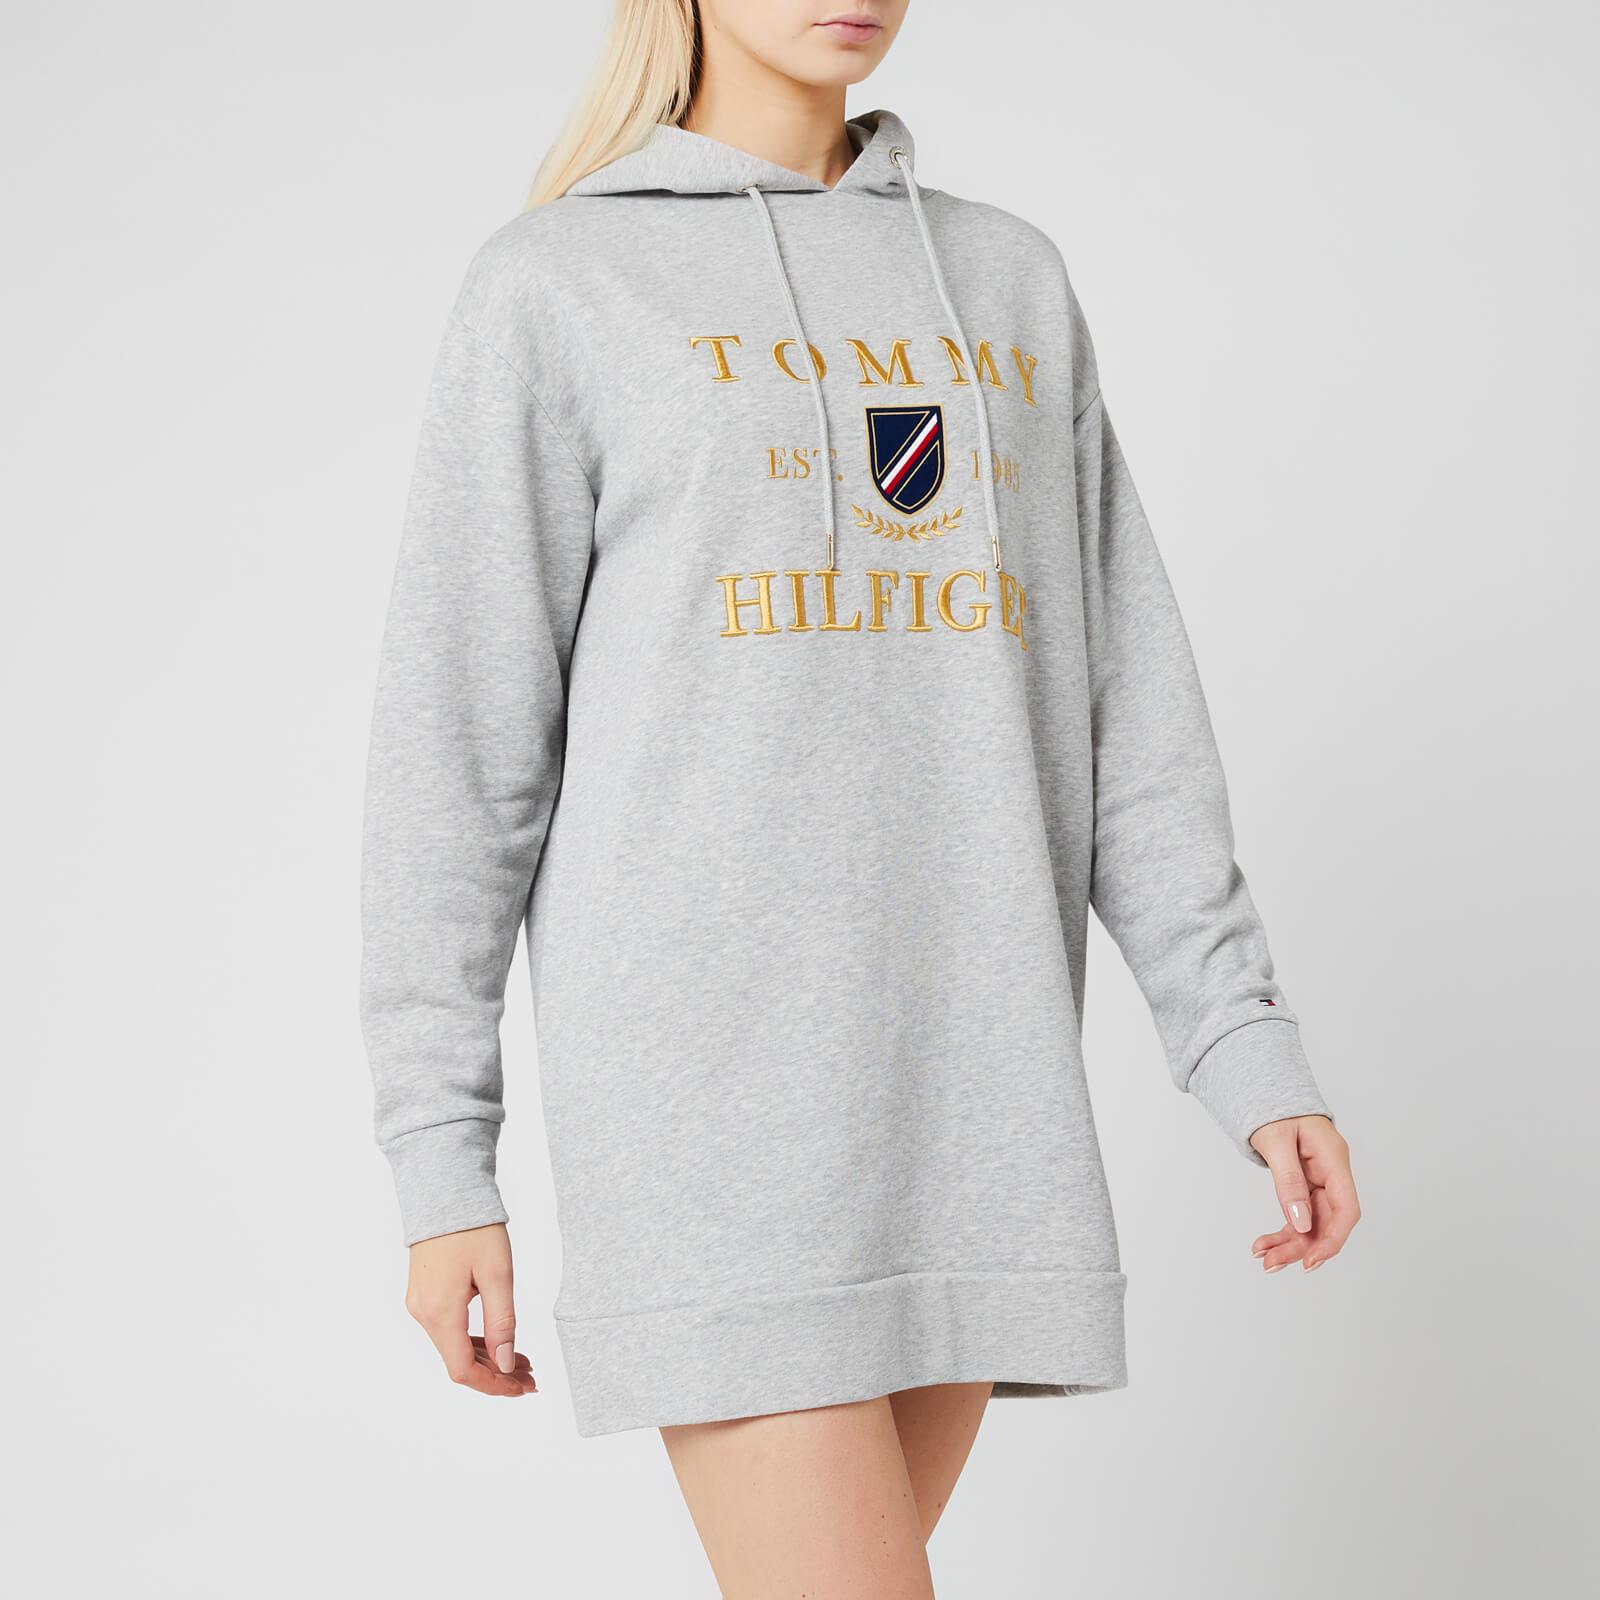 Tommy Hilfiger Women's Kristal Hooded Terry Dress Long Sleeve - Light Grey Heather - M